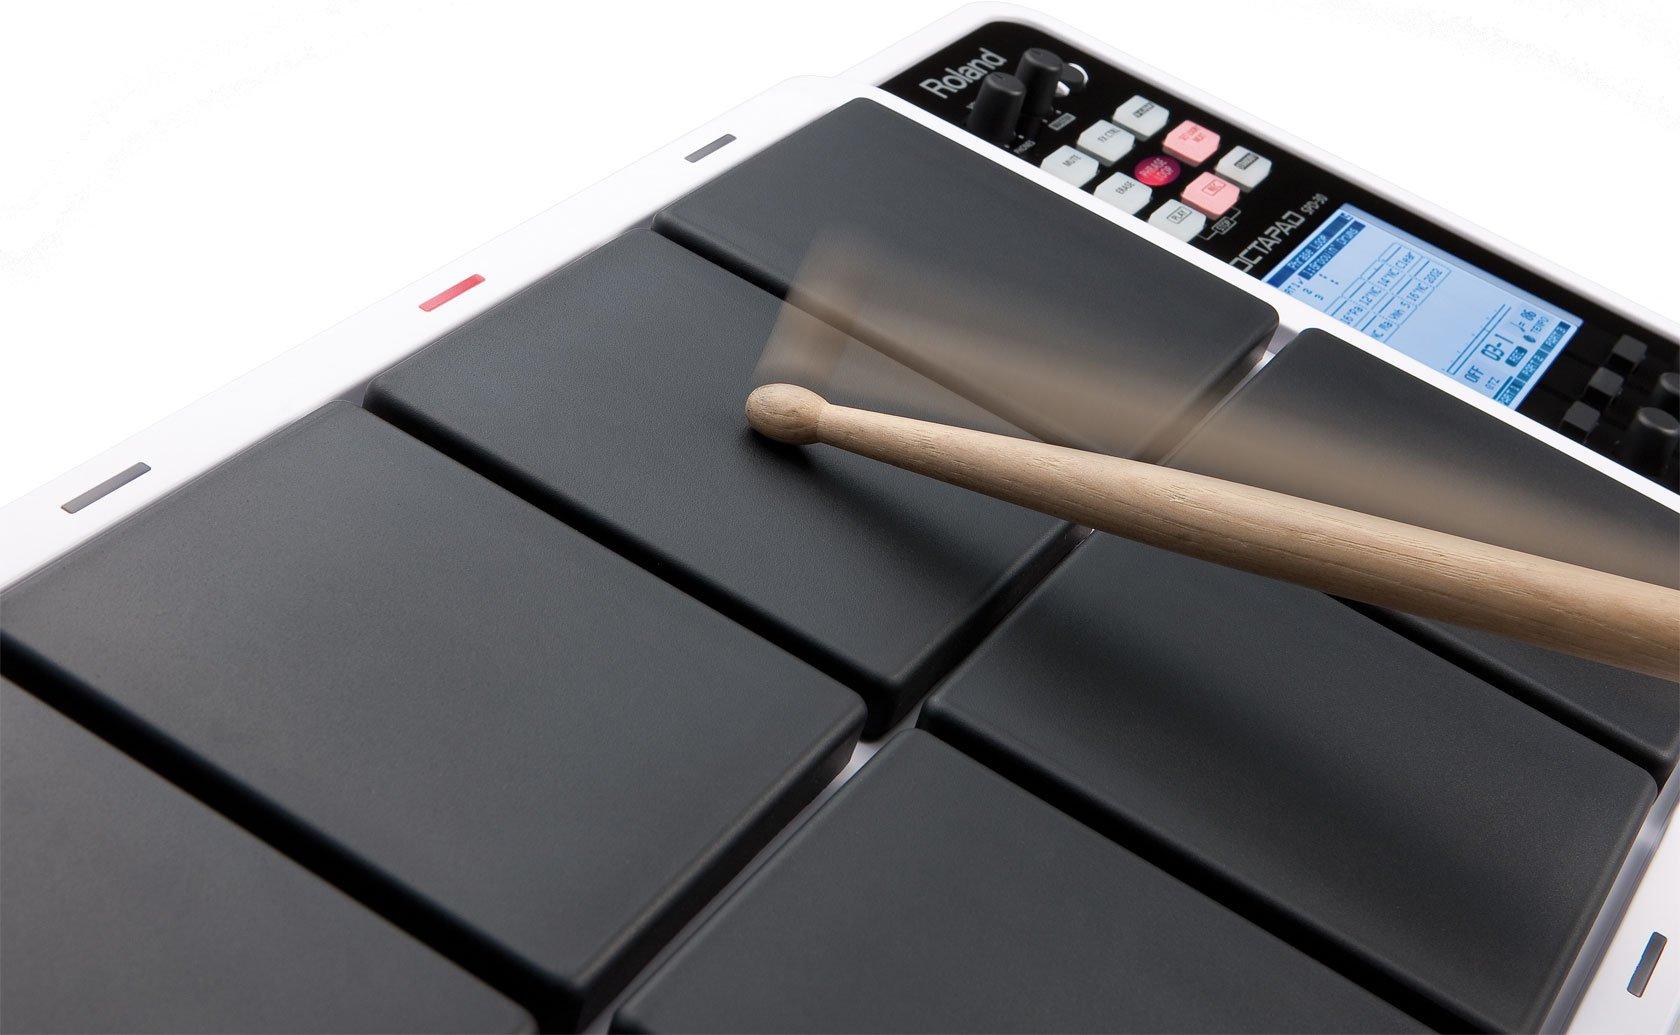 Roland OCTAPAD Digital Percussion Pad, black (SPD-30-BK) by Roland (Image #4)